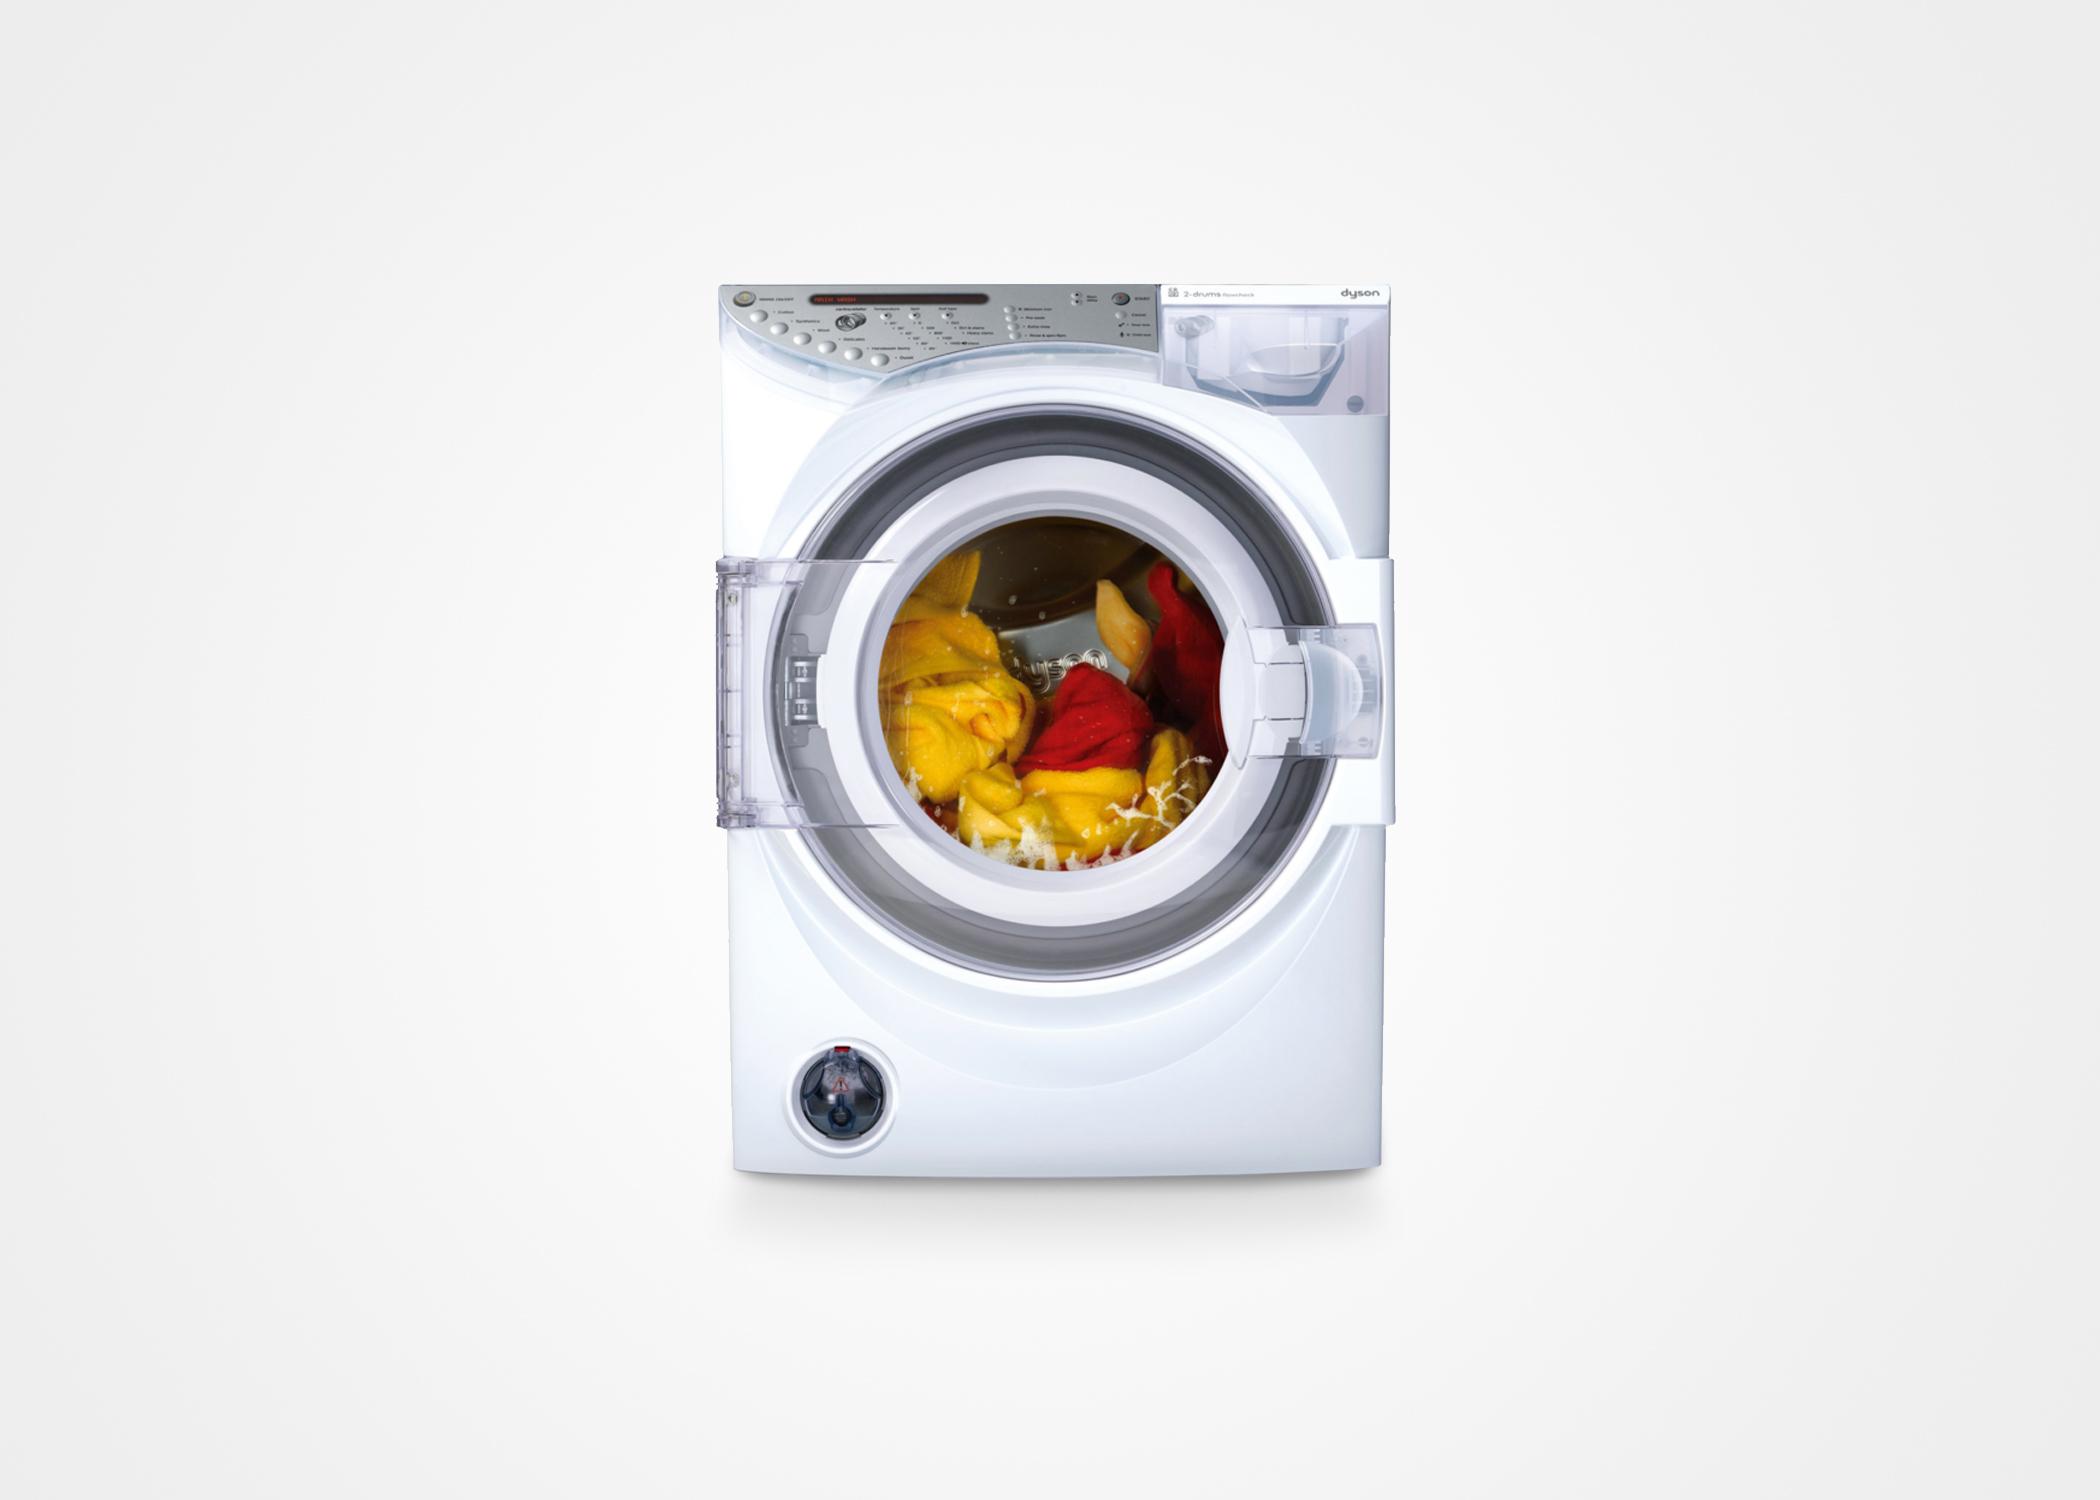 Reviving revolution in washing